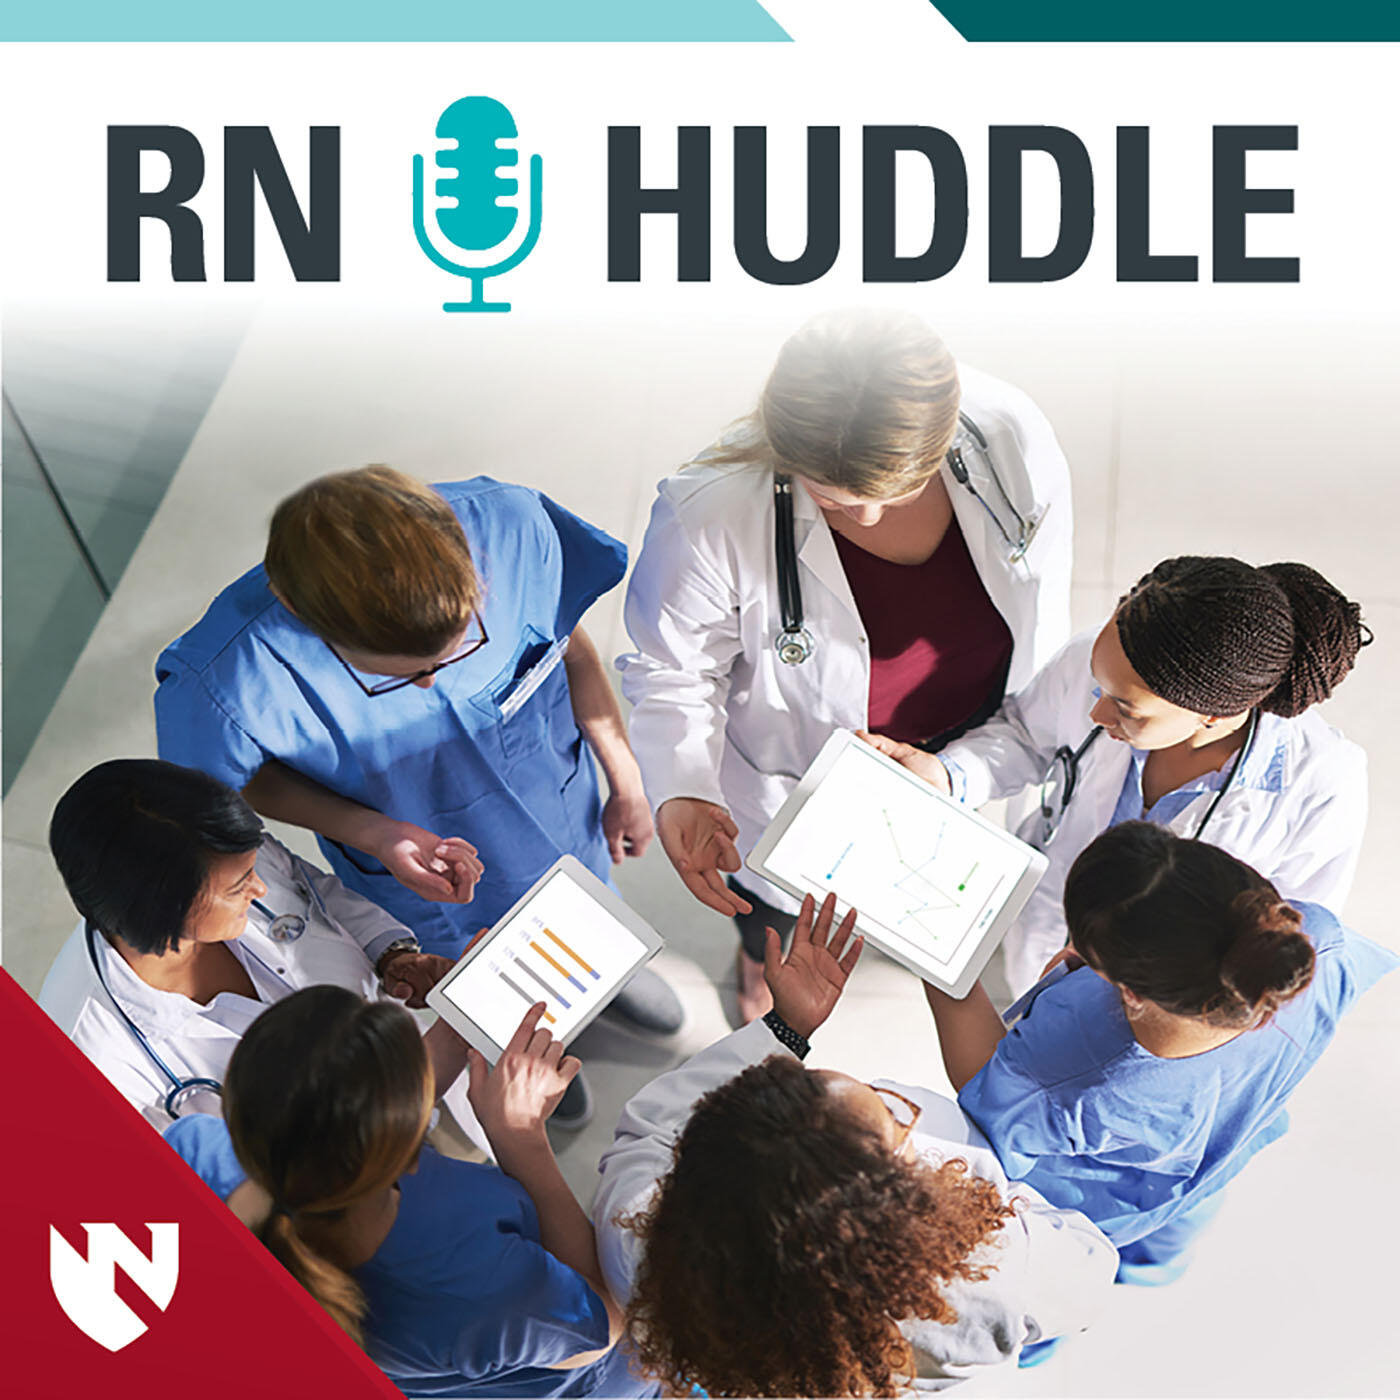 RNHuddle Podcast Activities - Nursing Hot Topics